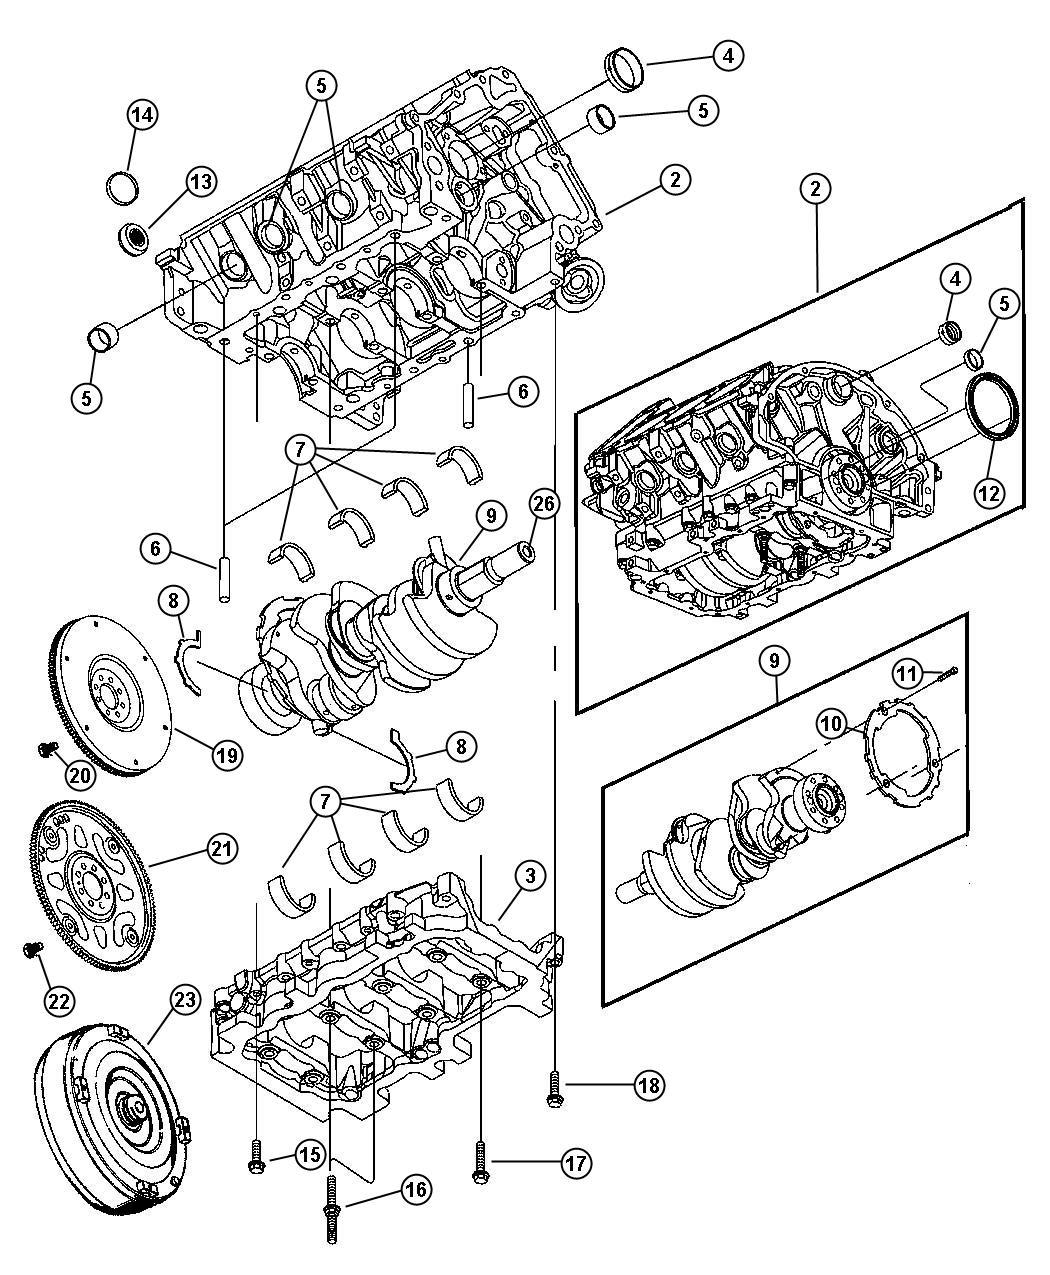 Jeep Liberty Renegade 3 7l V6 5 Speed Hd Manual